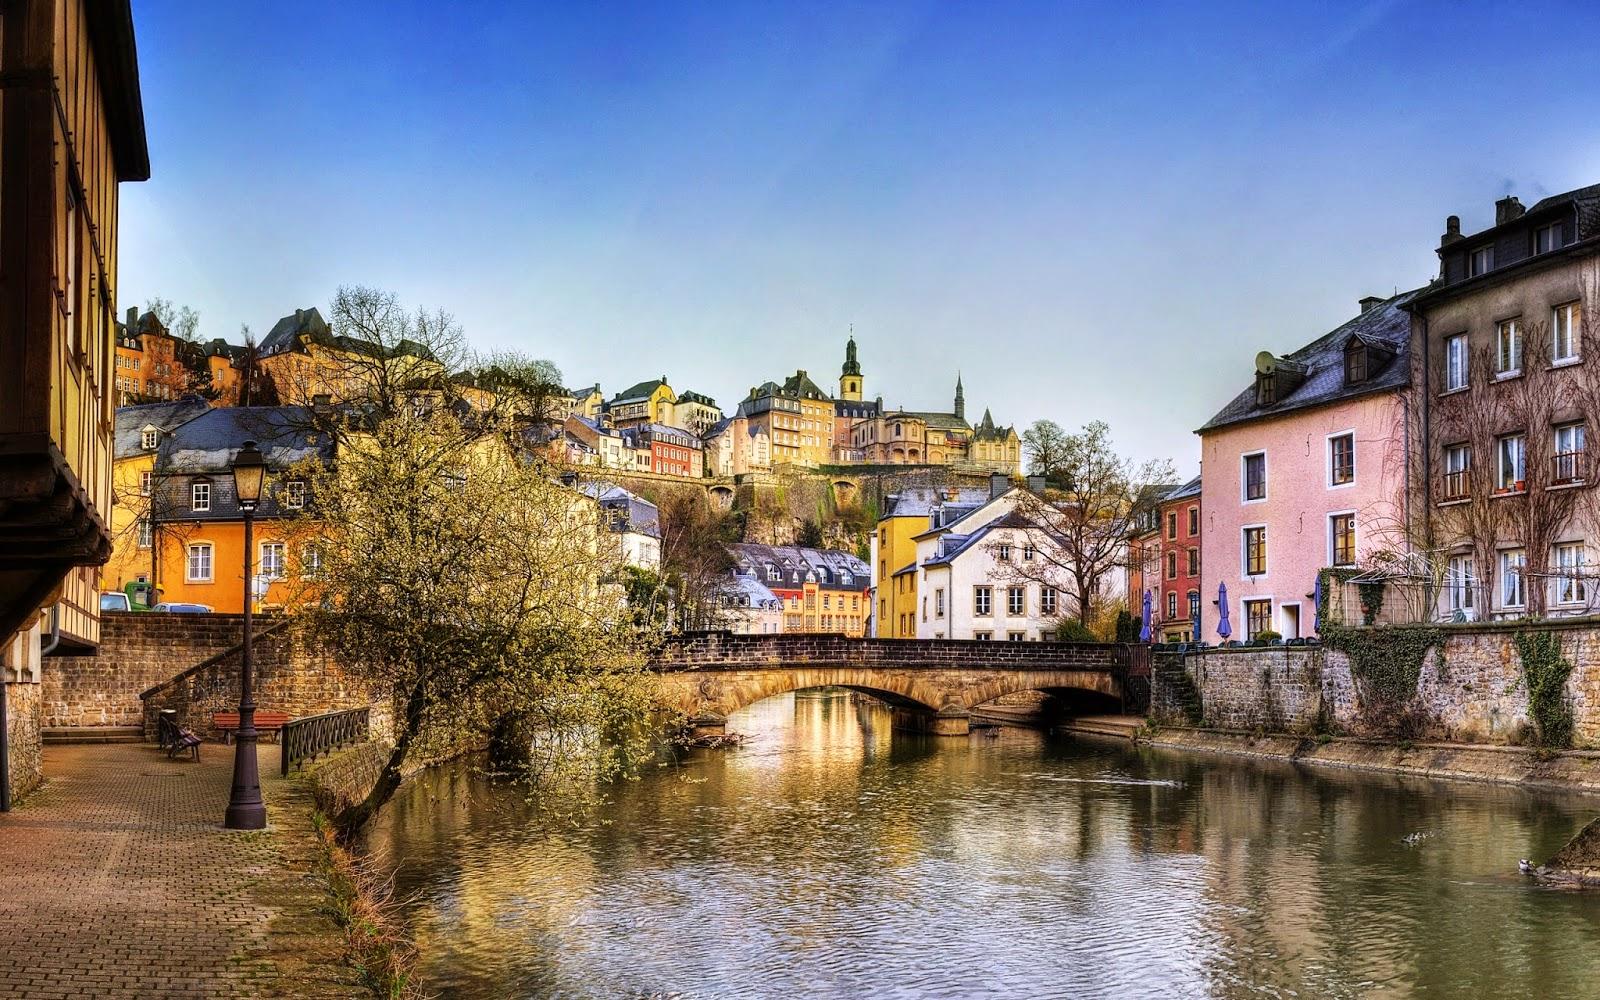 http://es.gde-fon.com/download/Luxemburgo_puente_da/57674/2560x1600